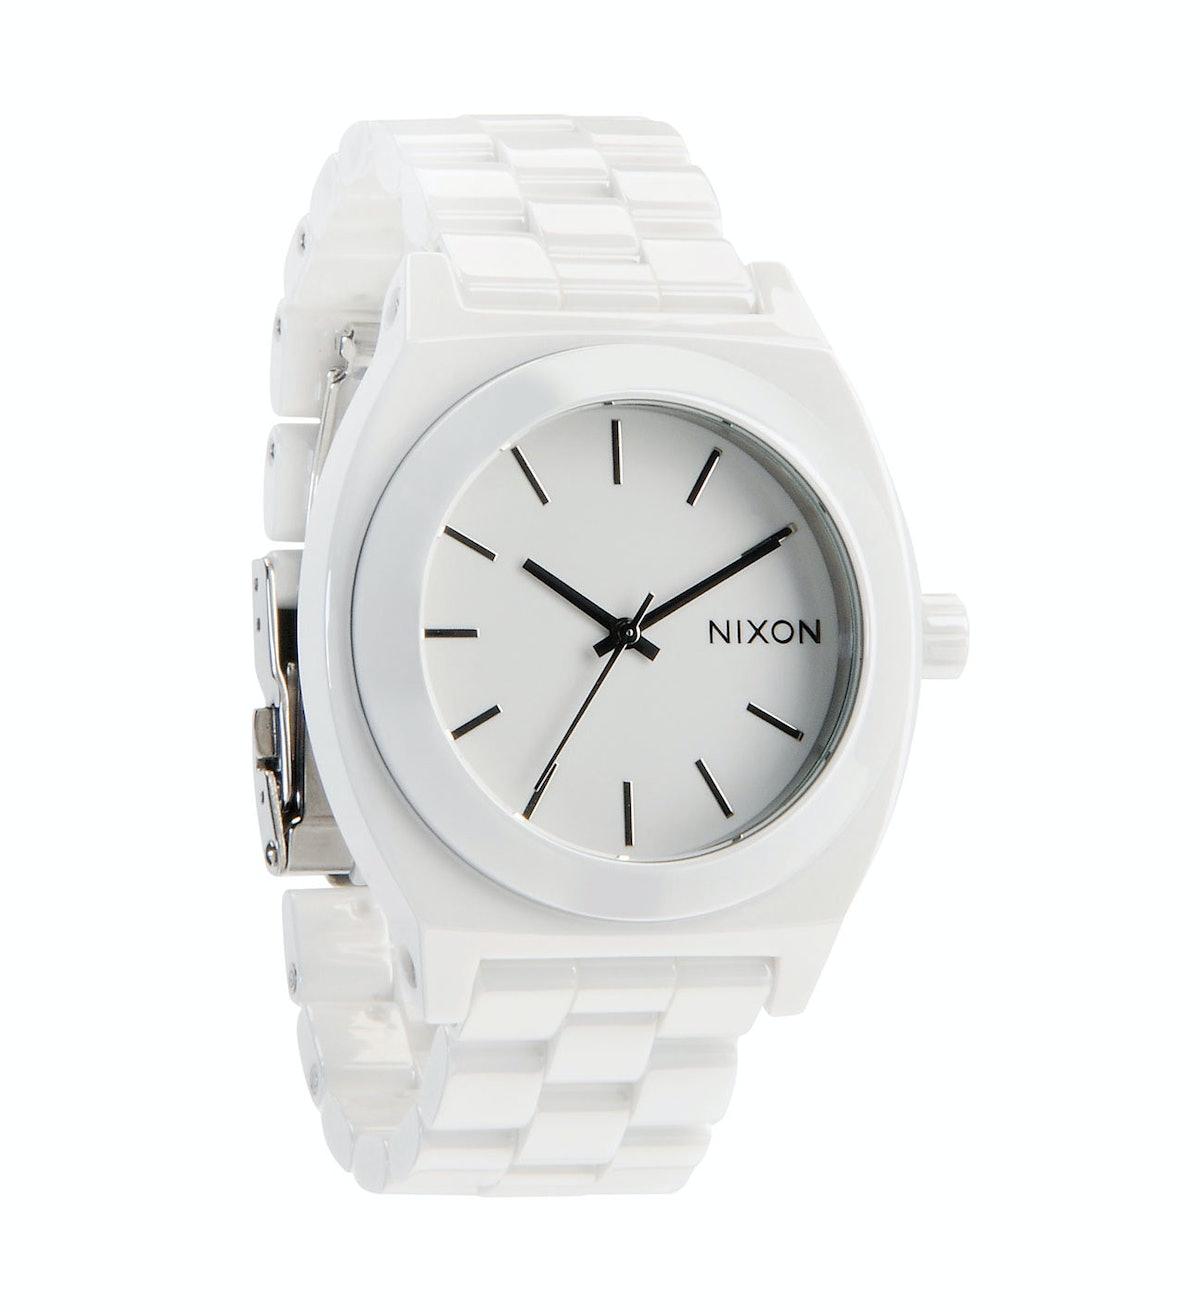 Nixon white watch